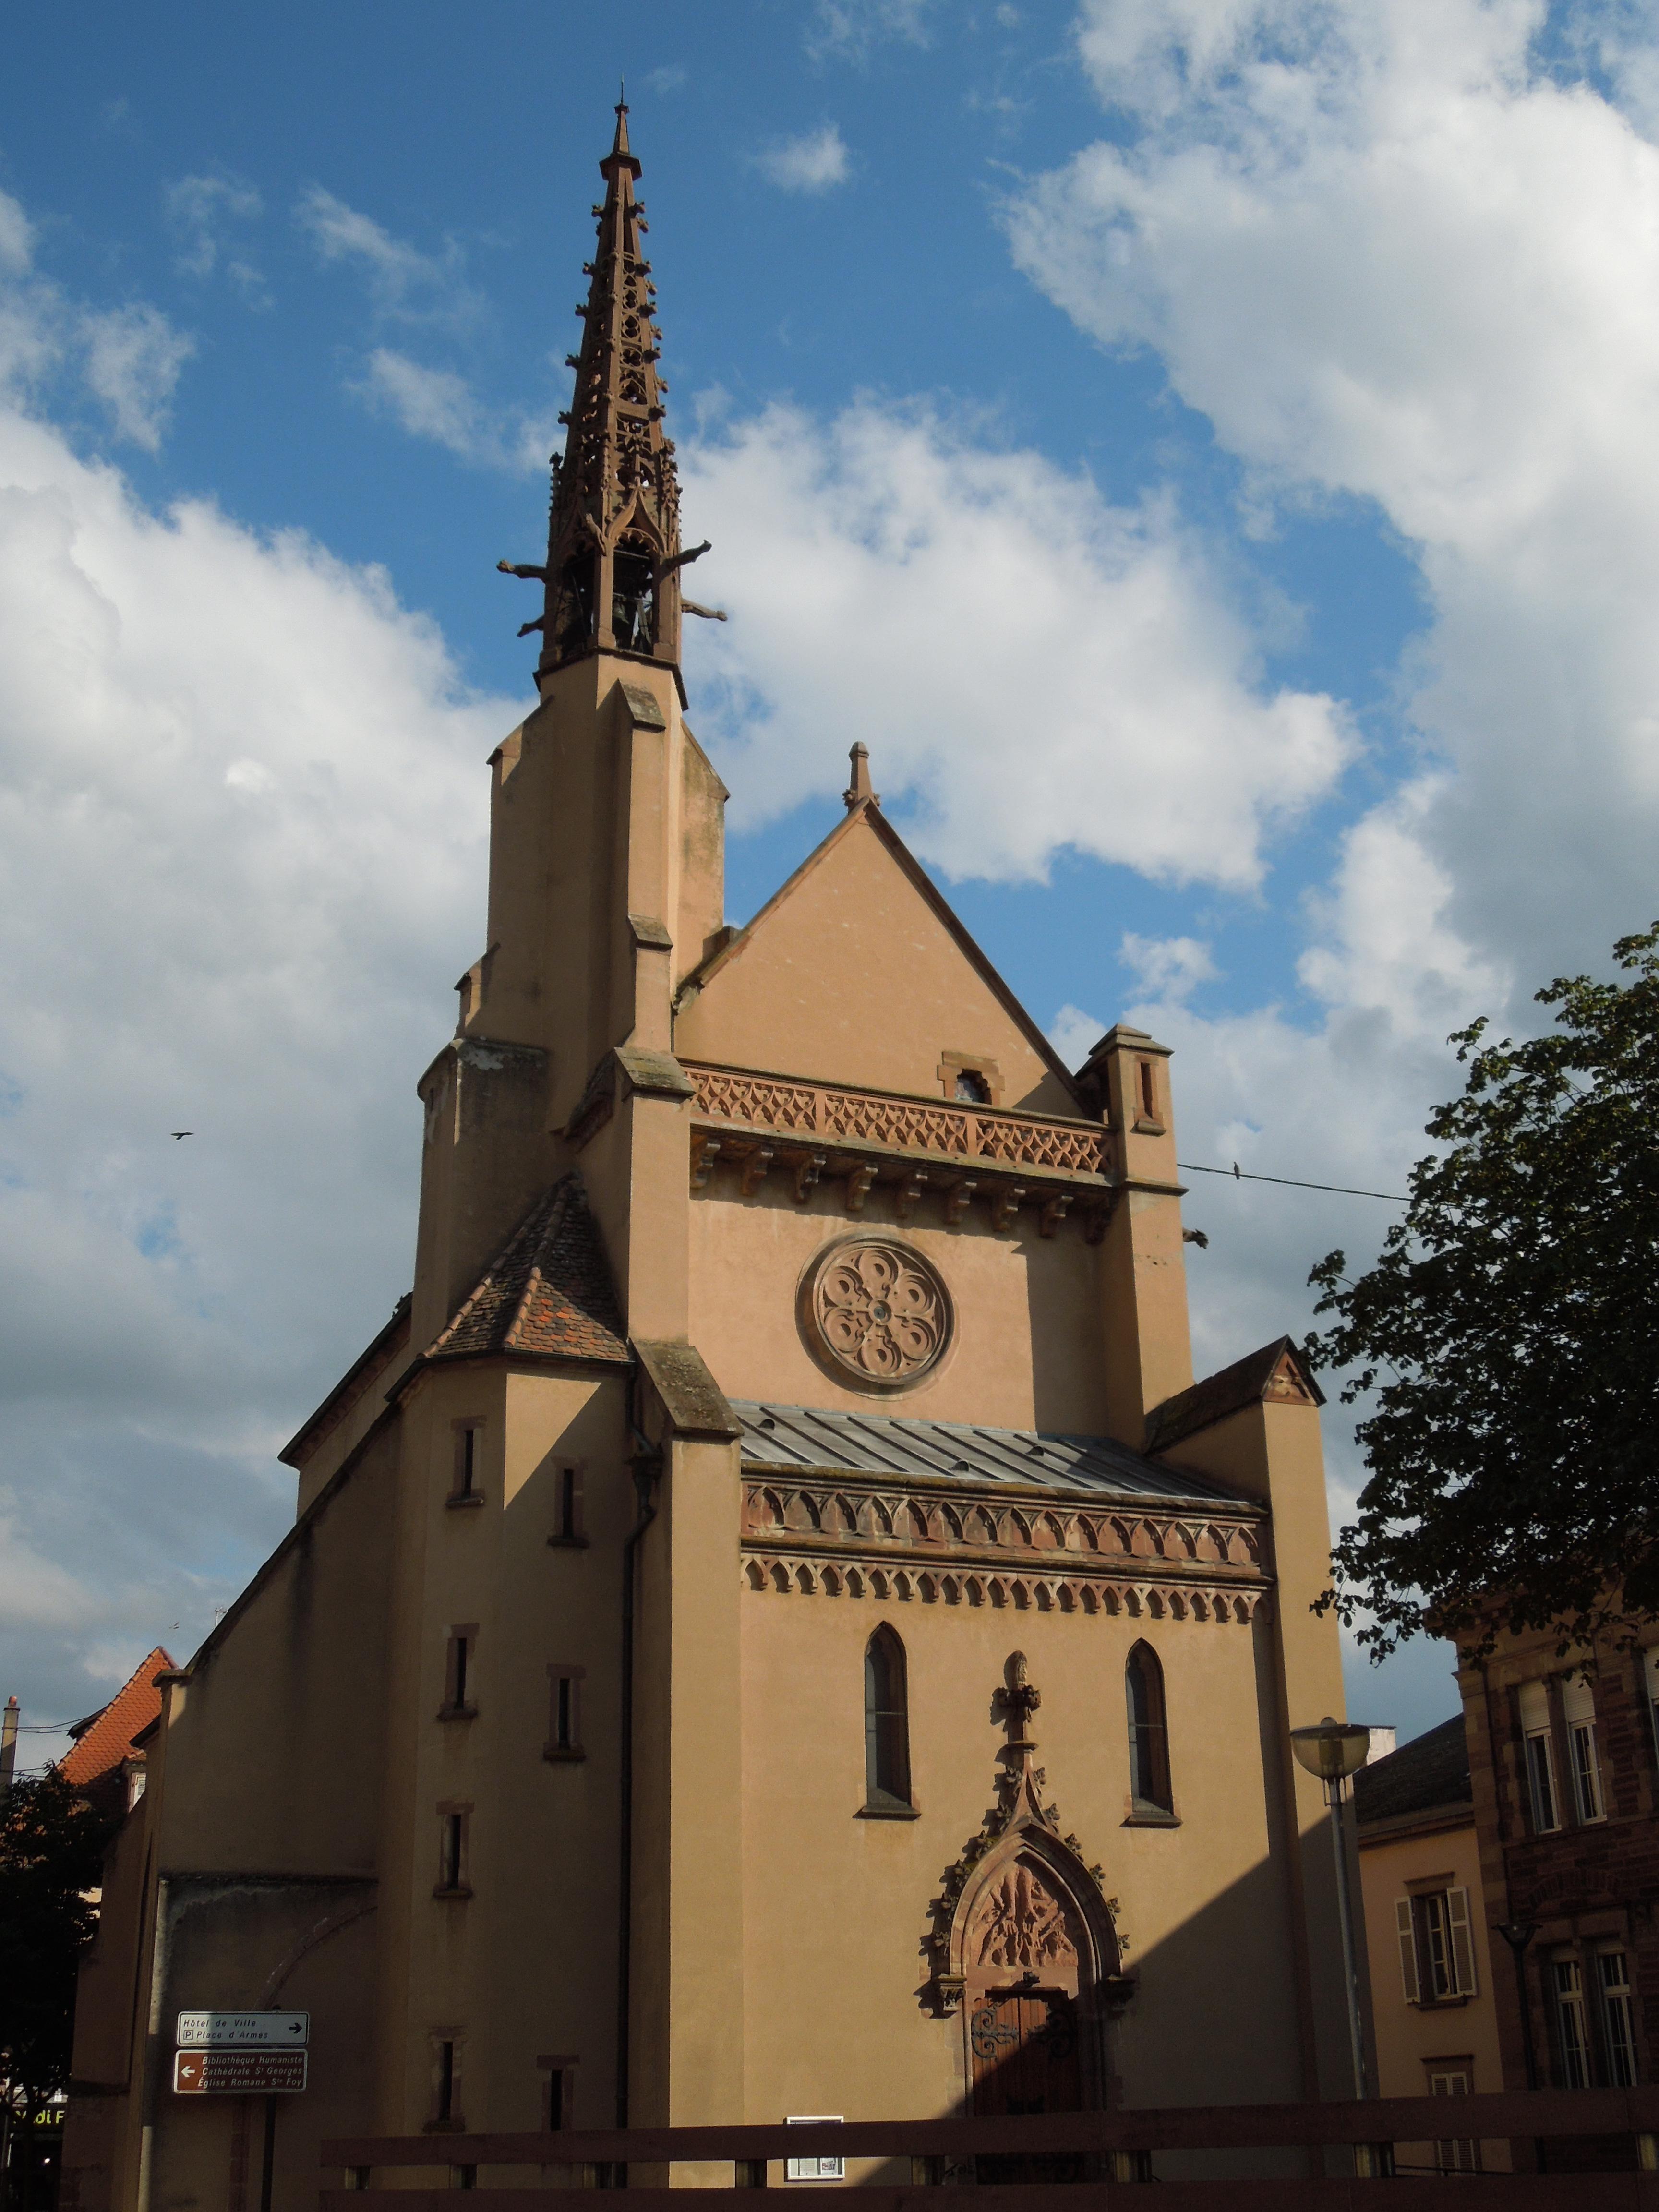 Architecte Bas Rhin file:bas-rhin, sélestat - Église protestante - wikimedia